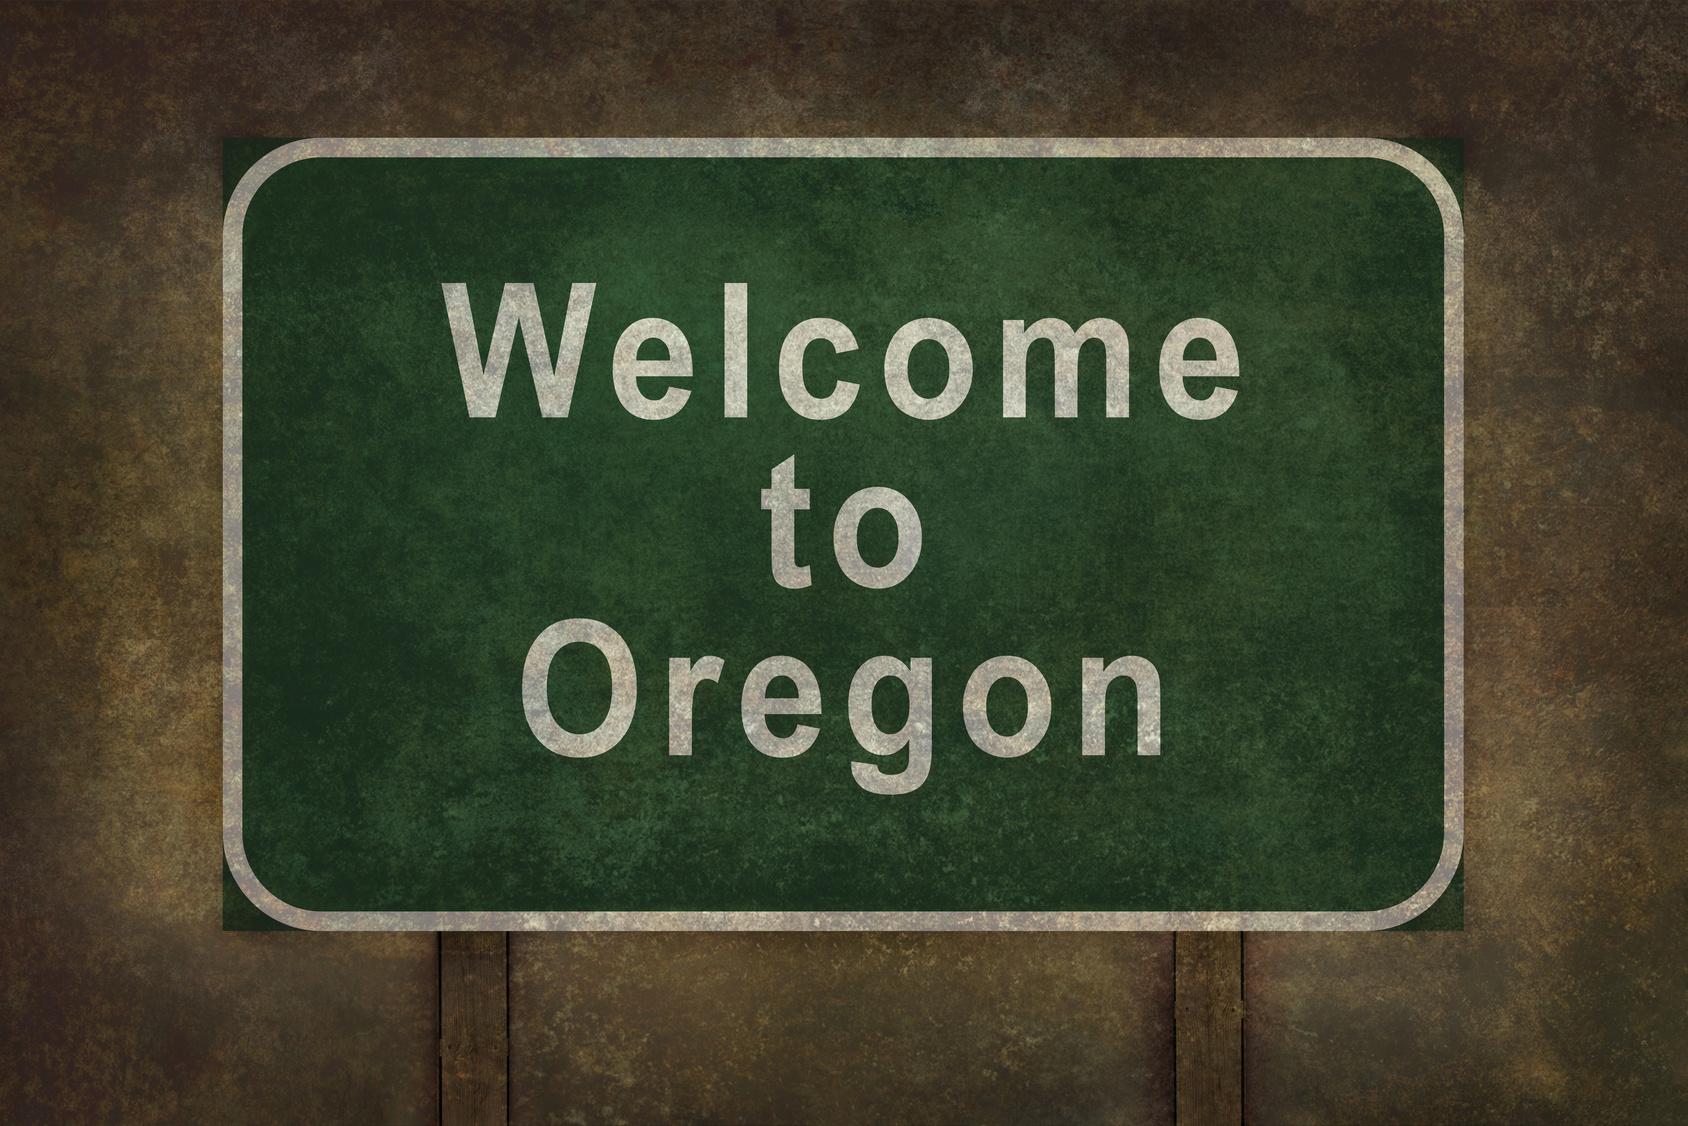 Oregon State Unemployment Insurance